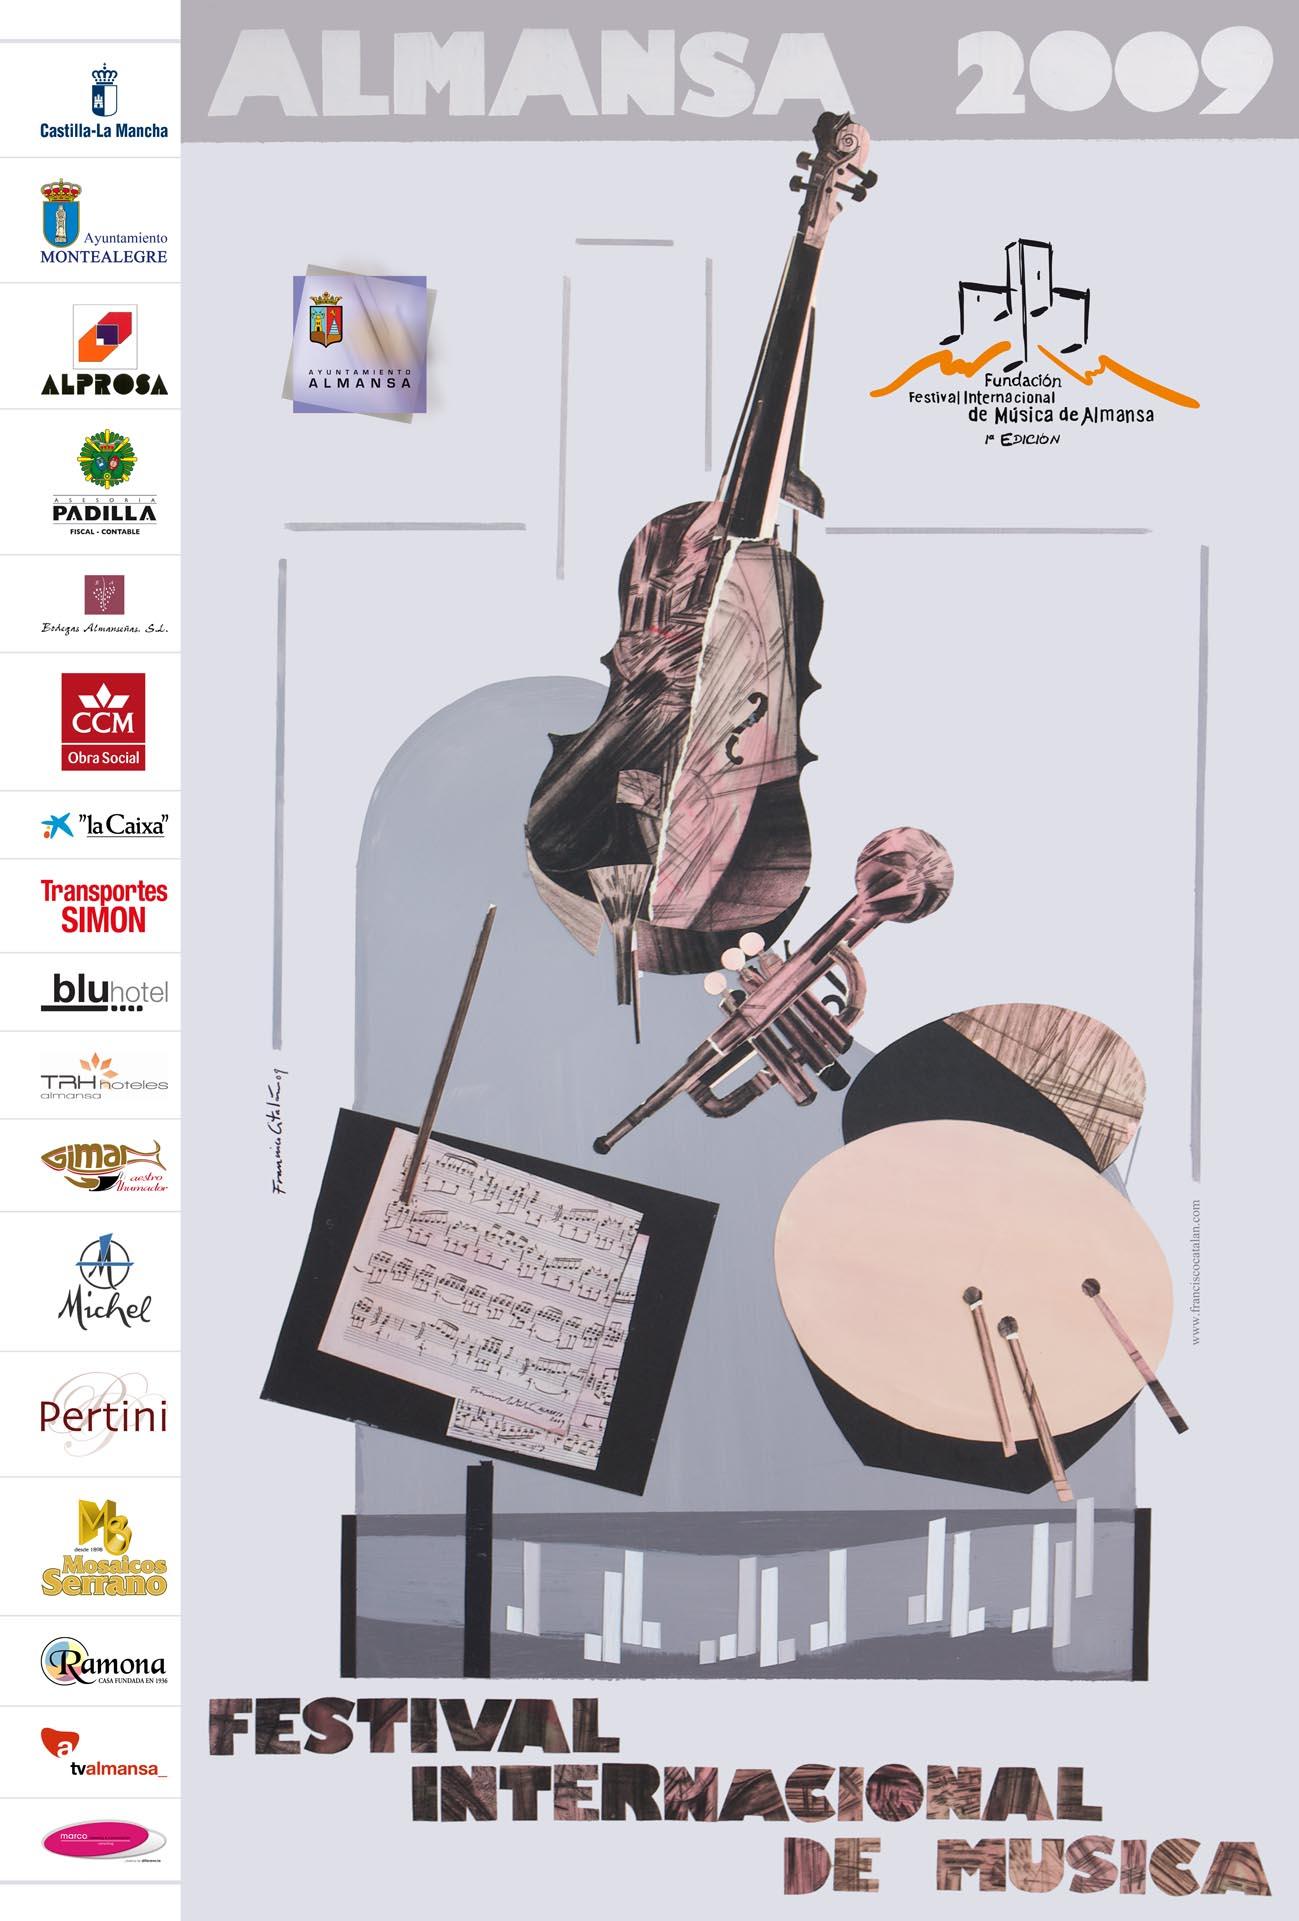 24.6.09.Cartel Festival de Musica.jpg